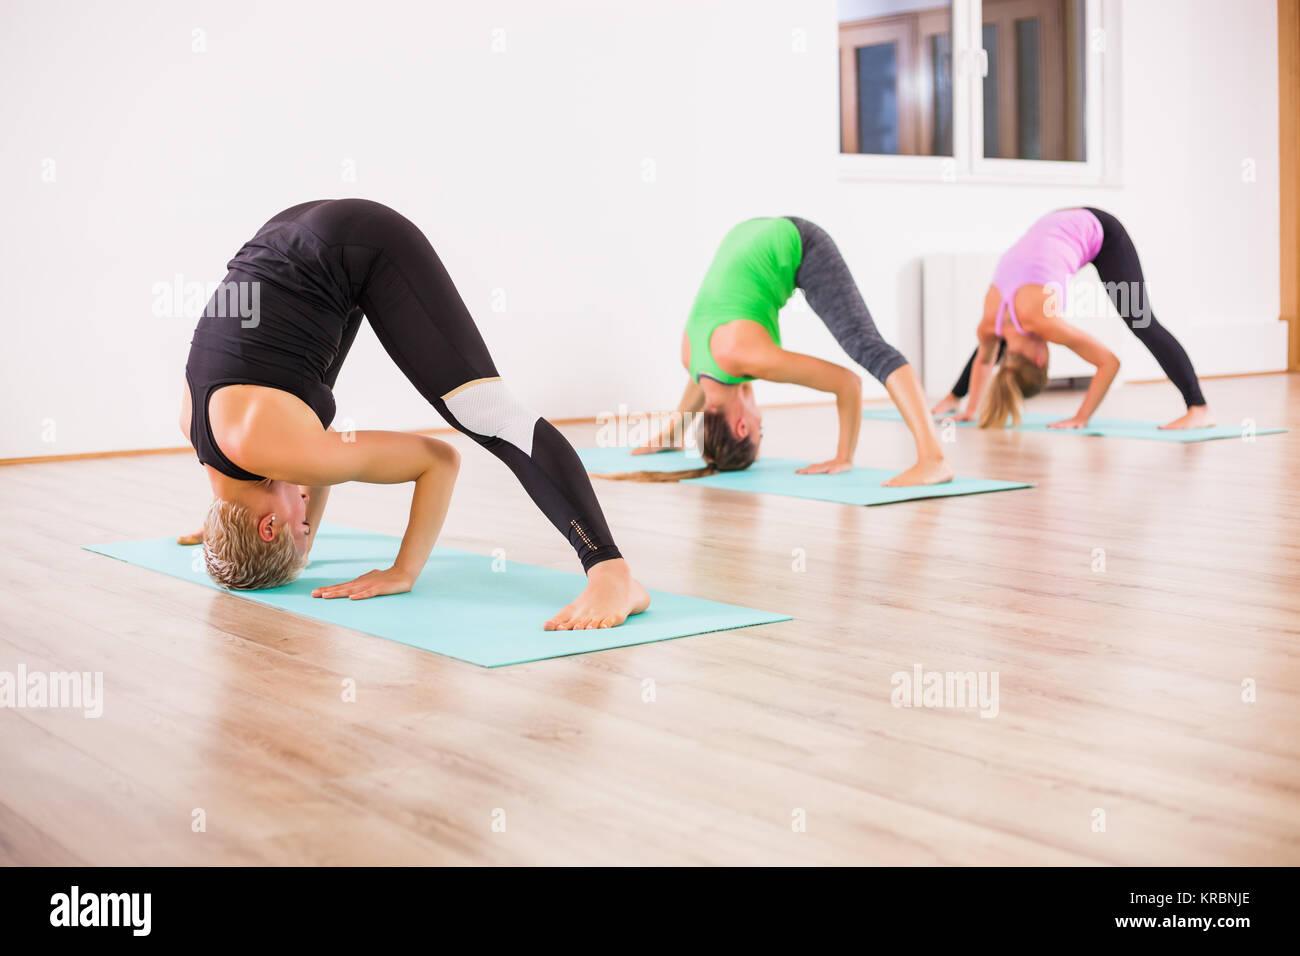 Tres chicas practicando yoga, Imagen De Stock